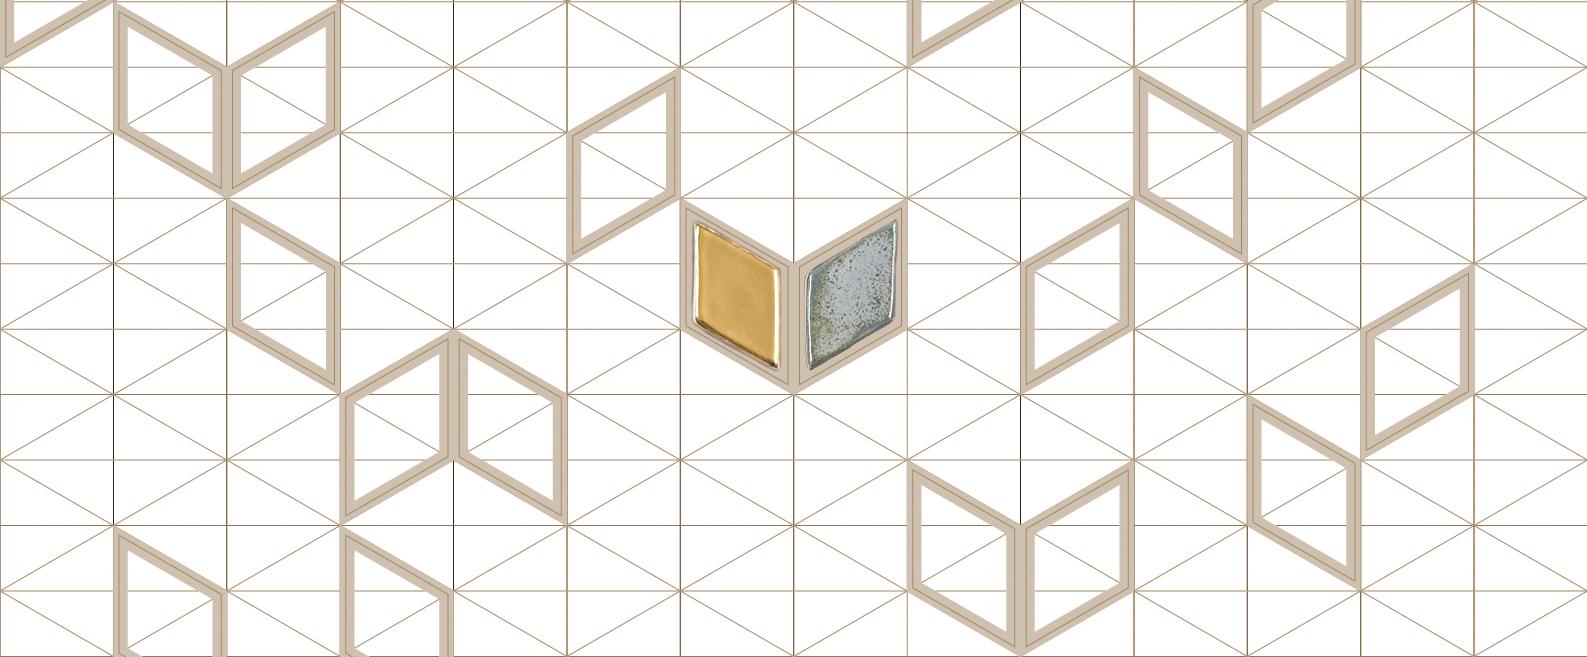 grid2_new5-2-02web1